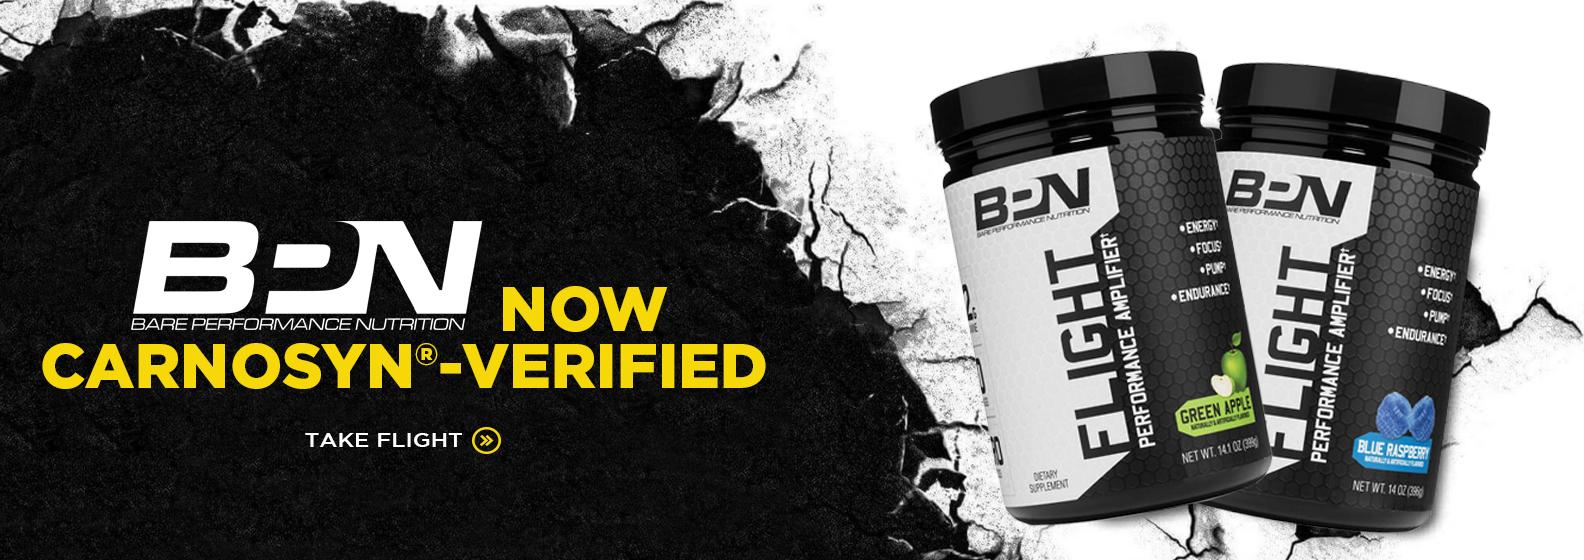 BPN powered by CarnoSyn beta-alanine